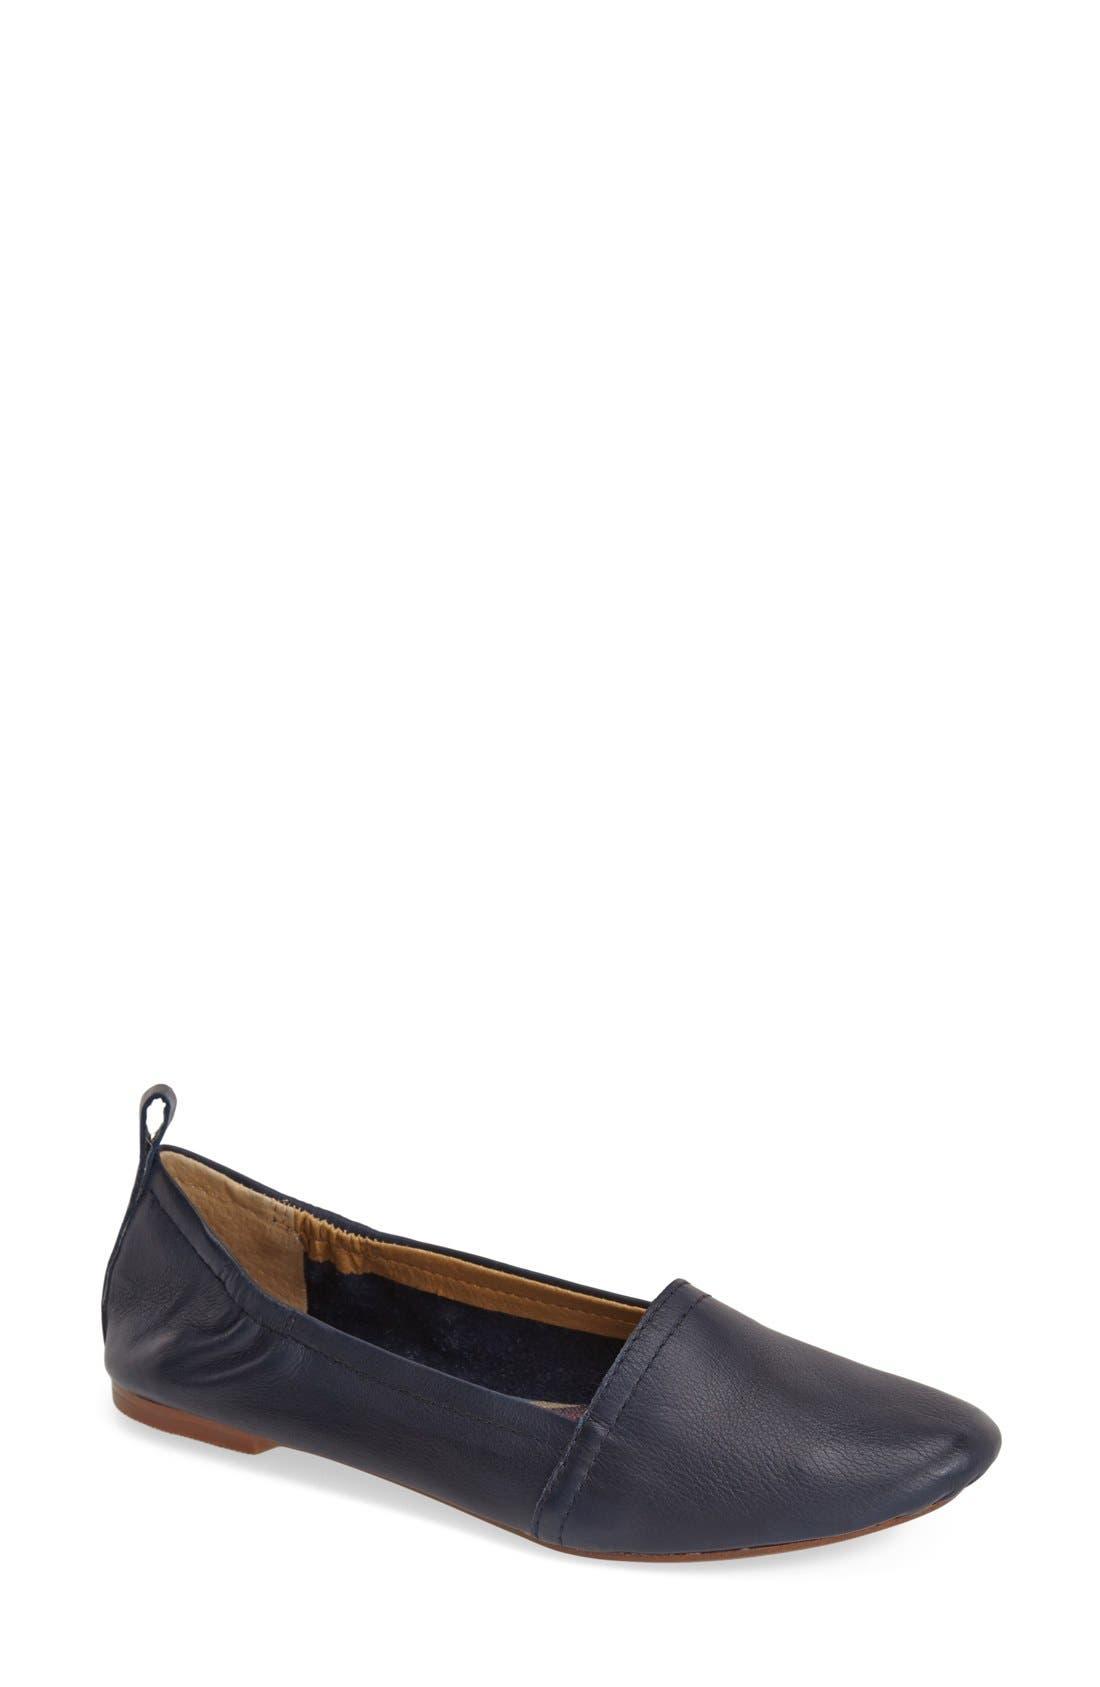 LATIGO Bettie Leather Flat